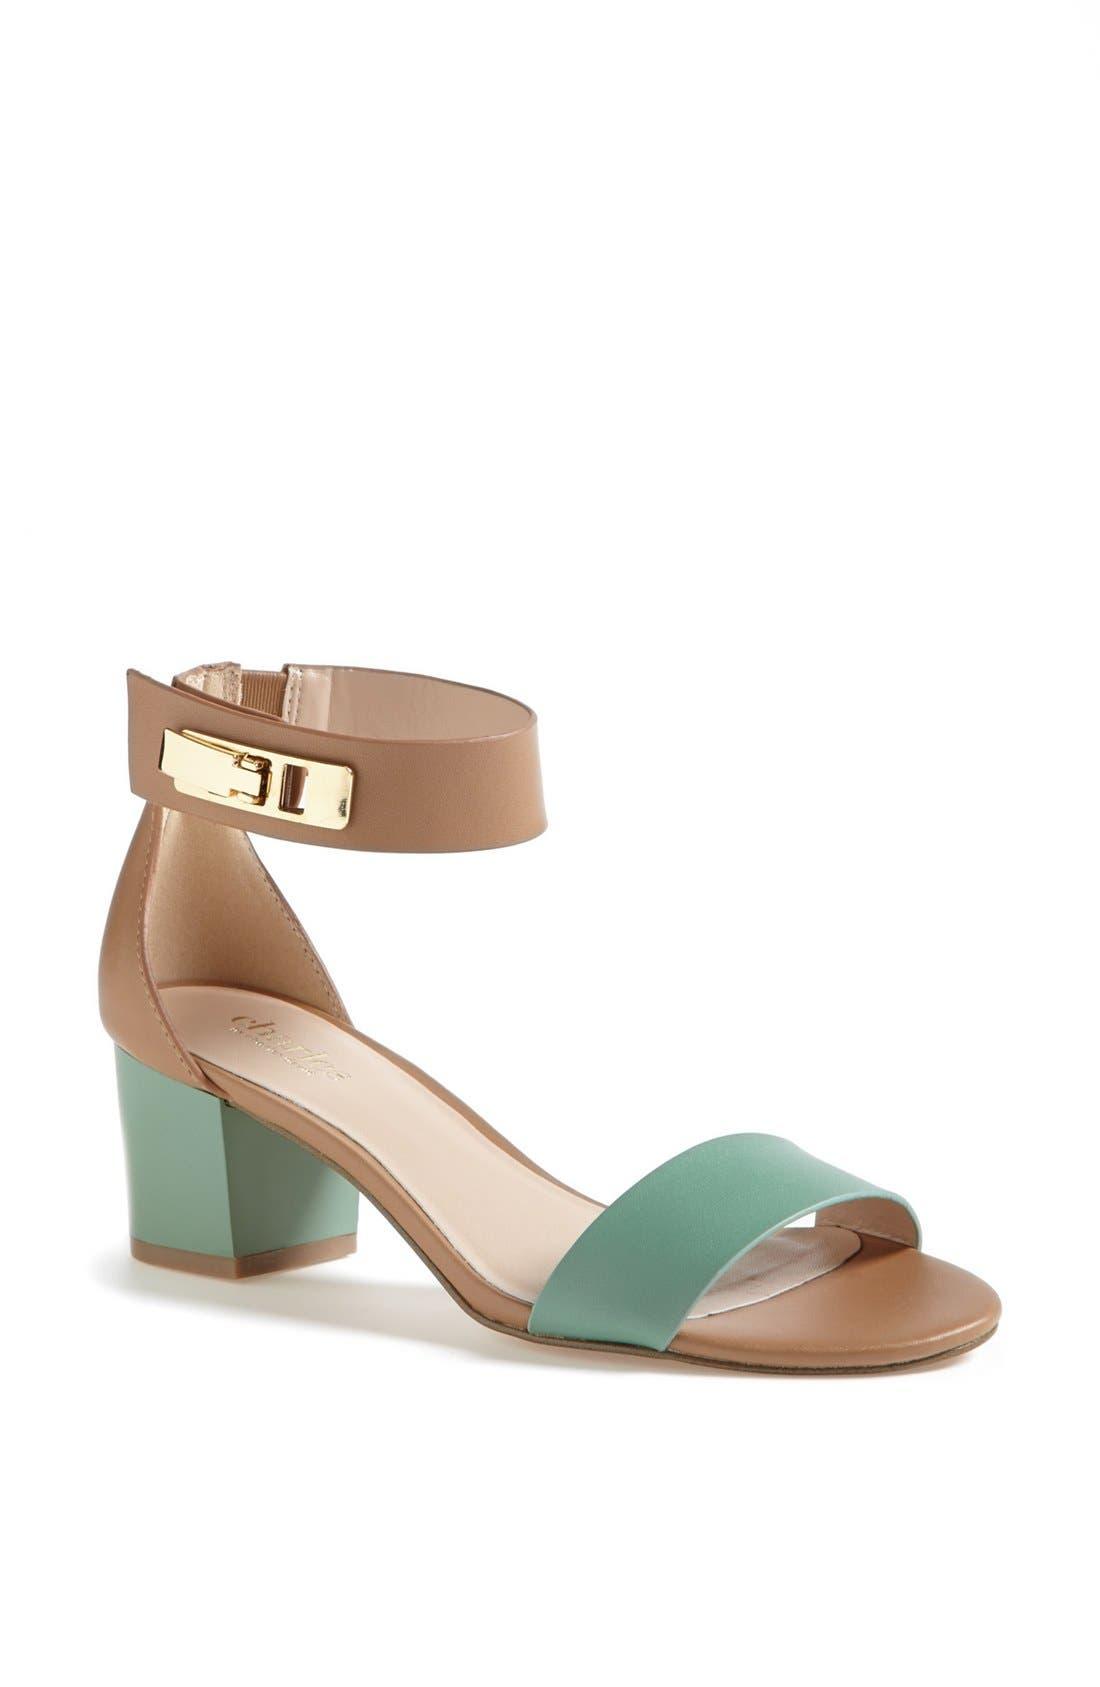 'Glory' Sandal,                         Main,                         color, Mint/ Nude